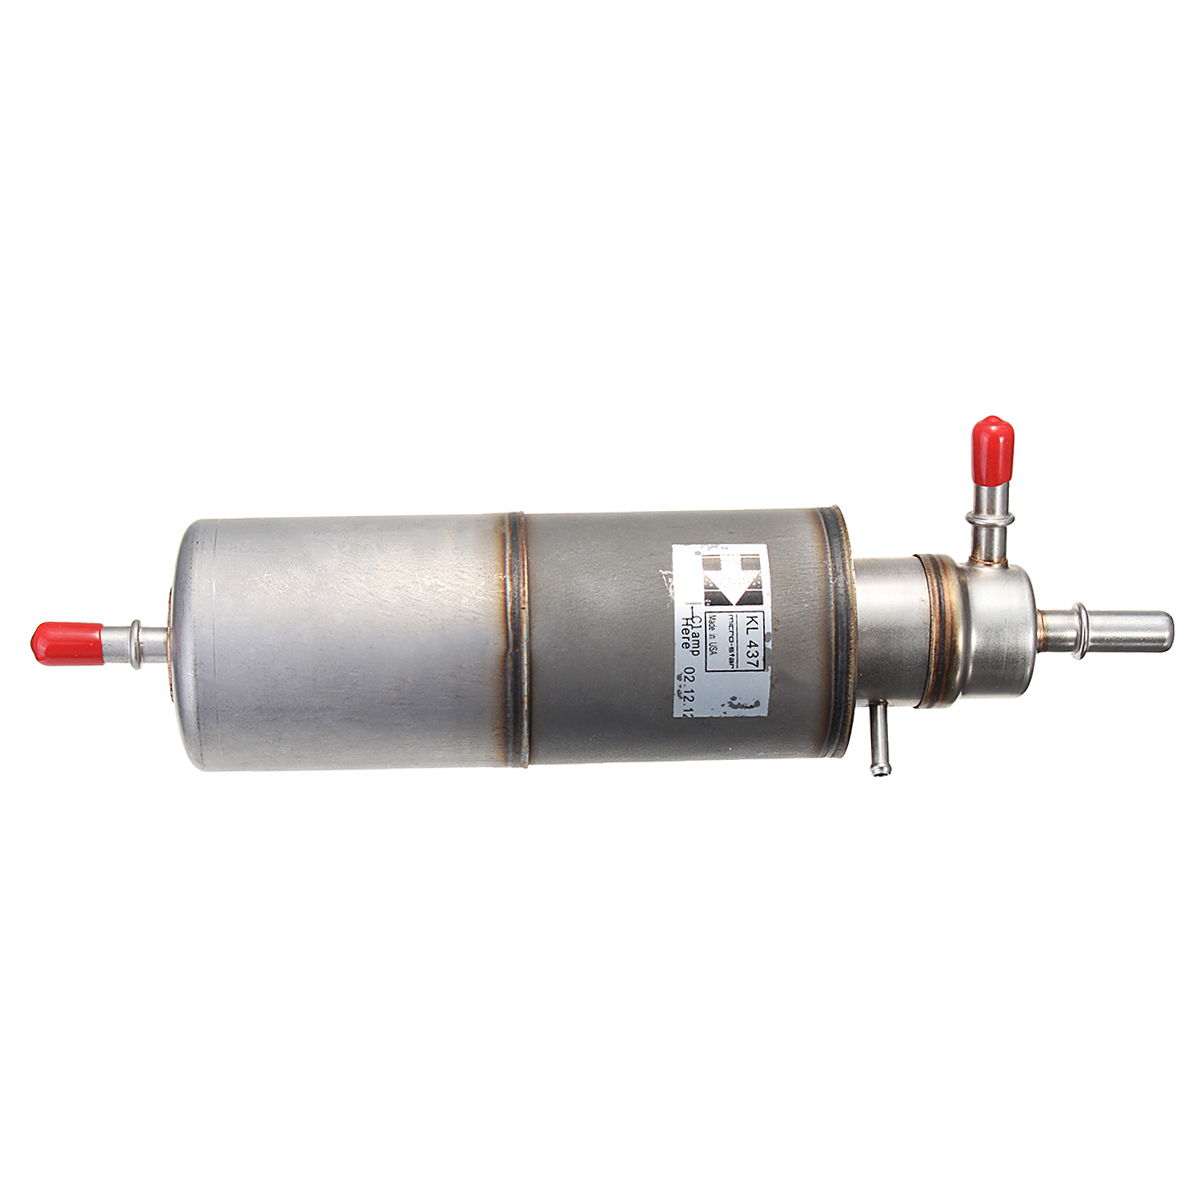 mercedes ml320 fuel filter location